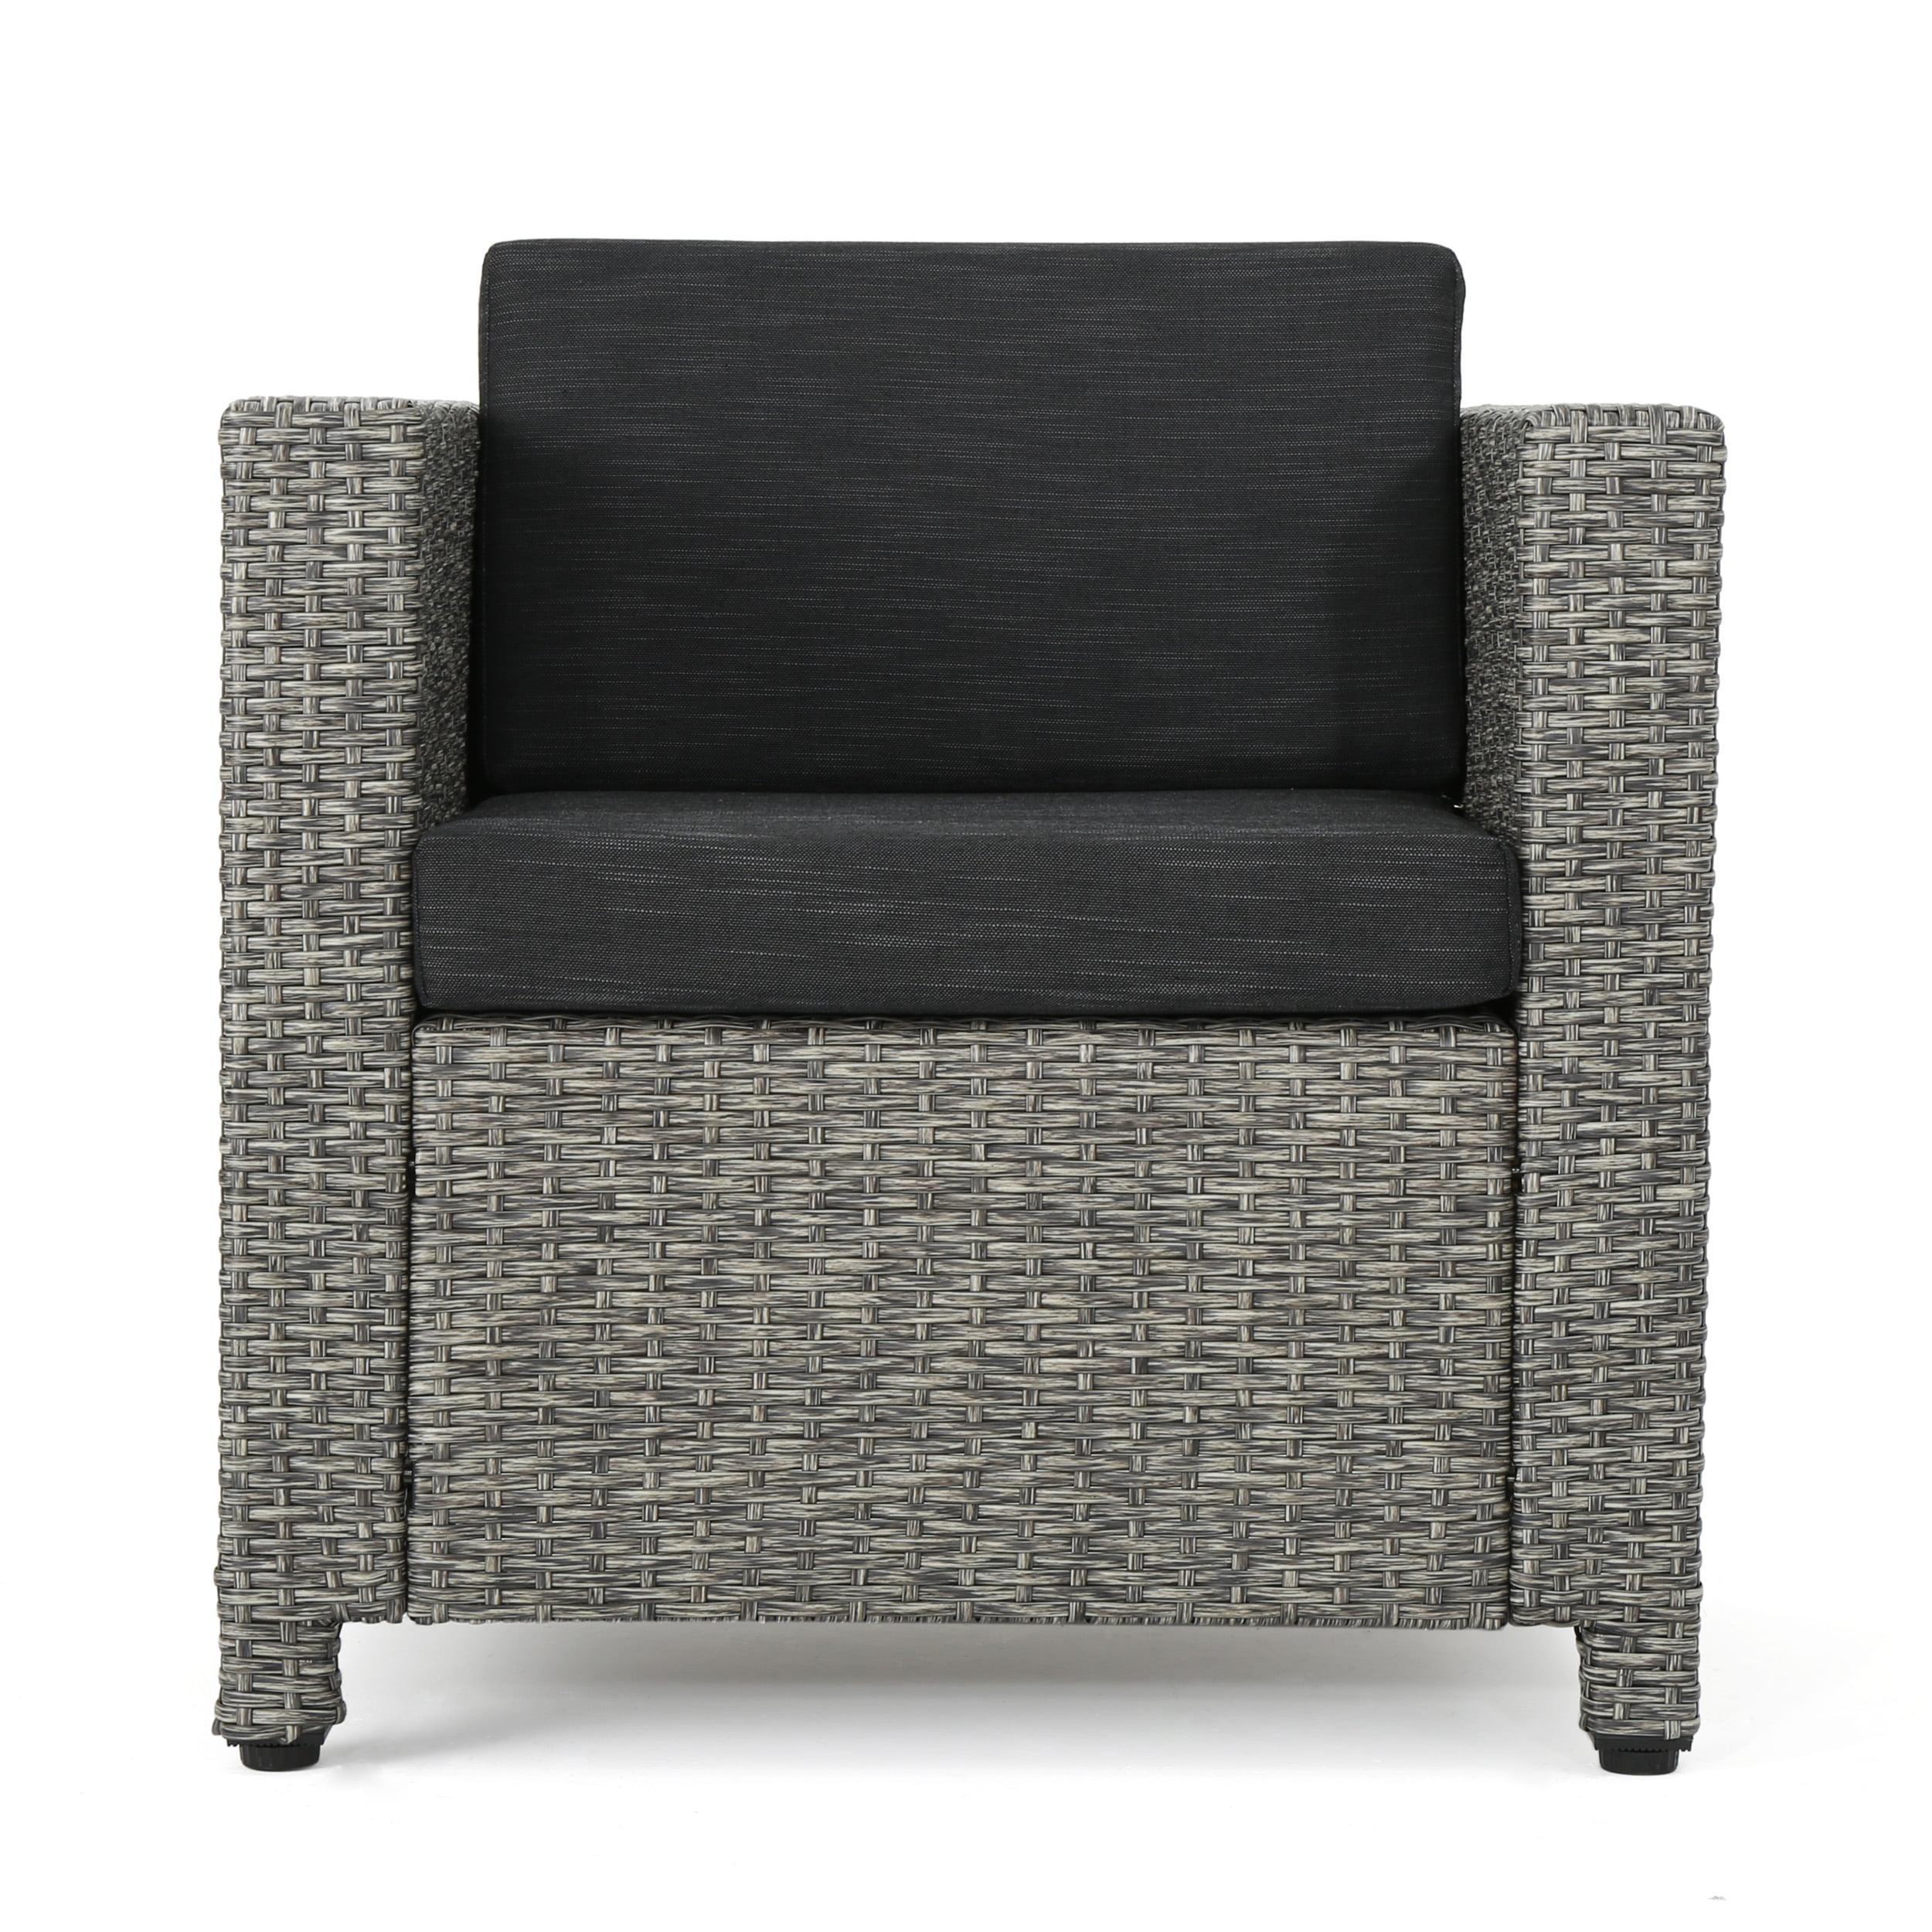 Pueblo Outdoor Wicker Club Chair with Dark Grey Water Resistant Cushions, Mixed Black